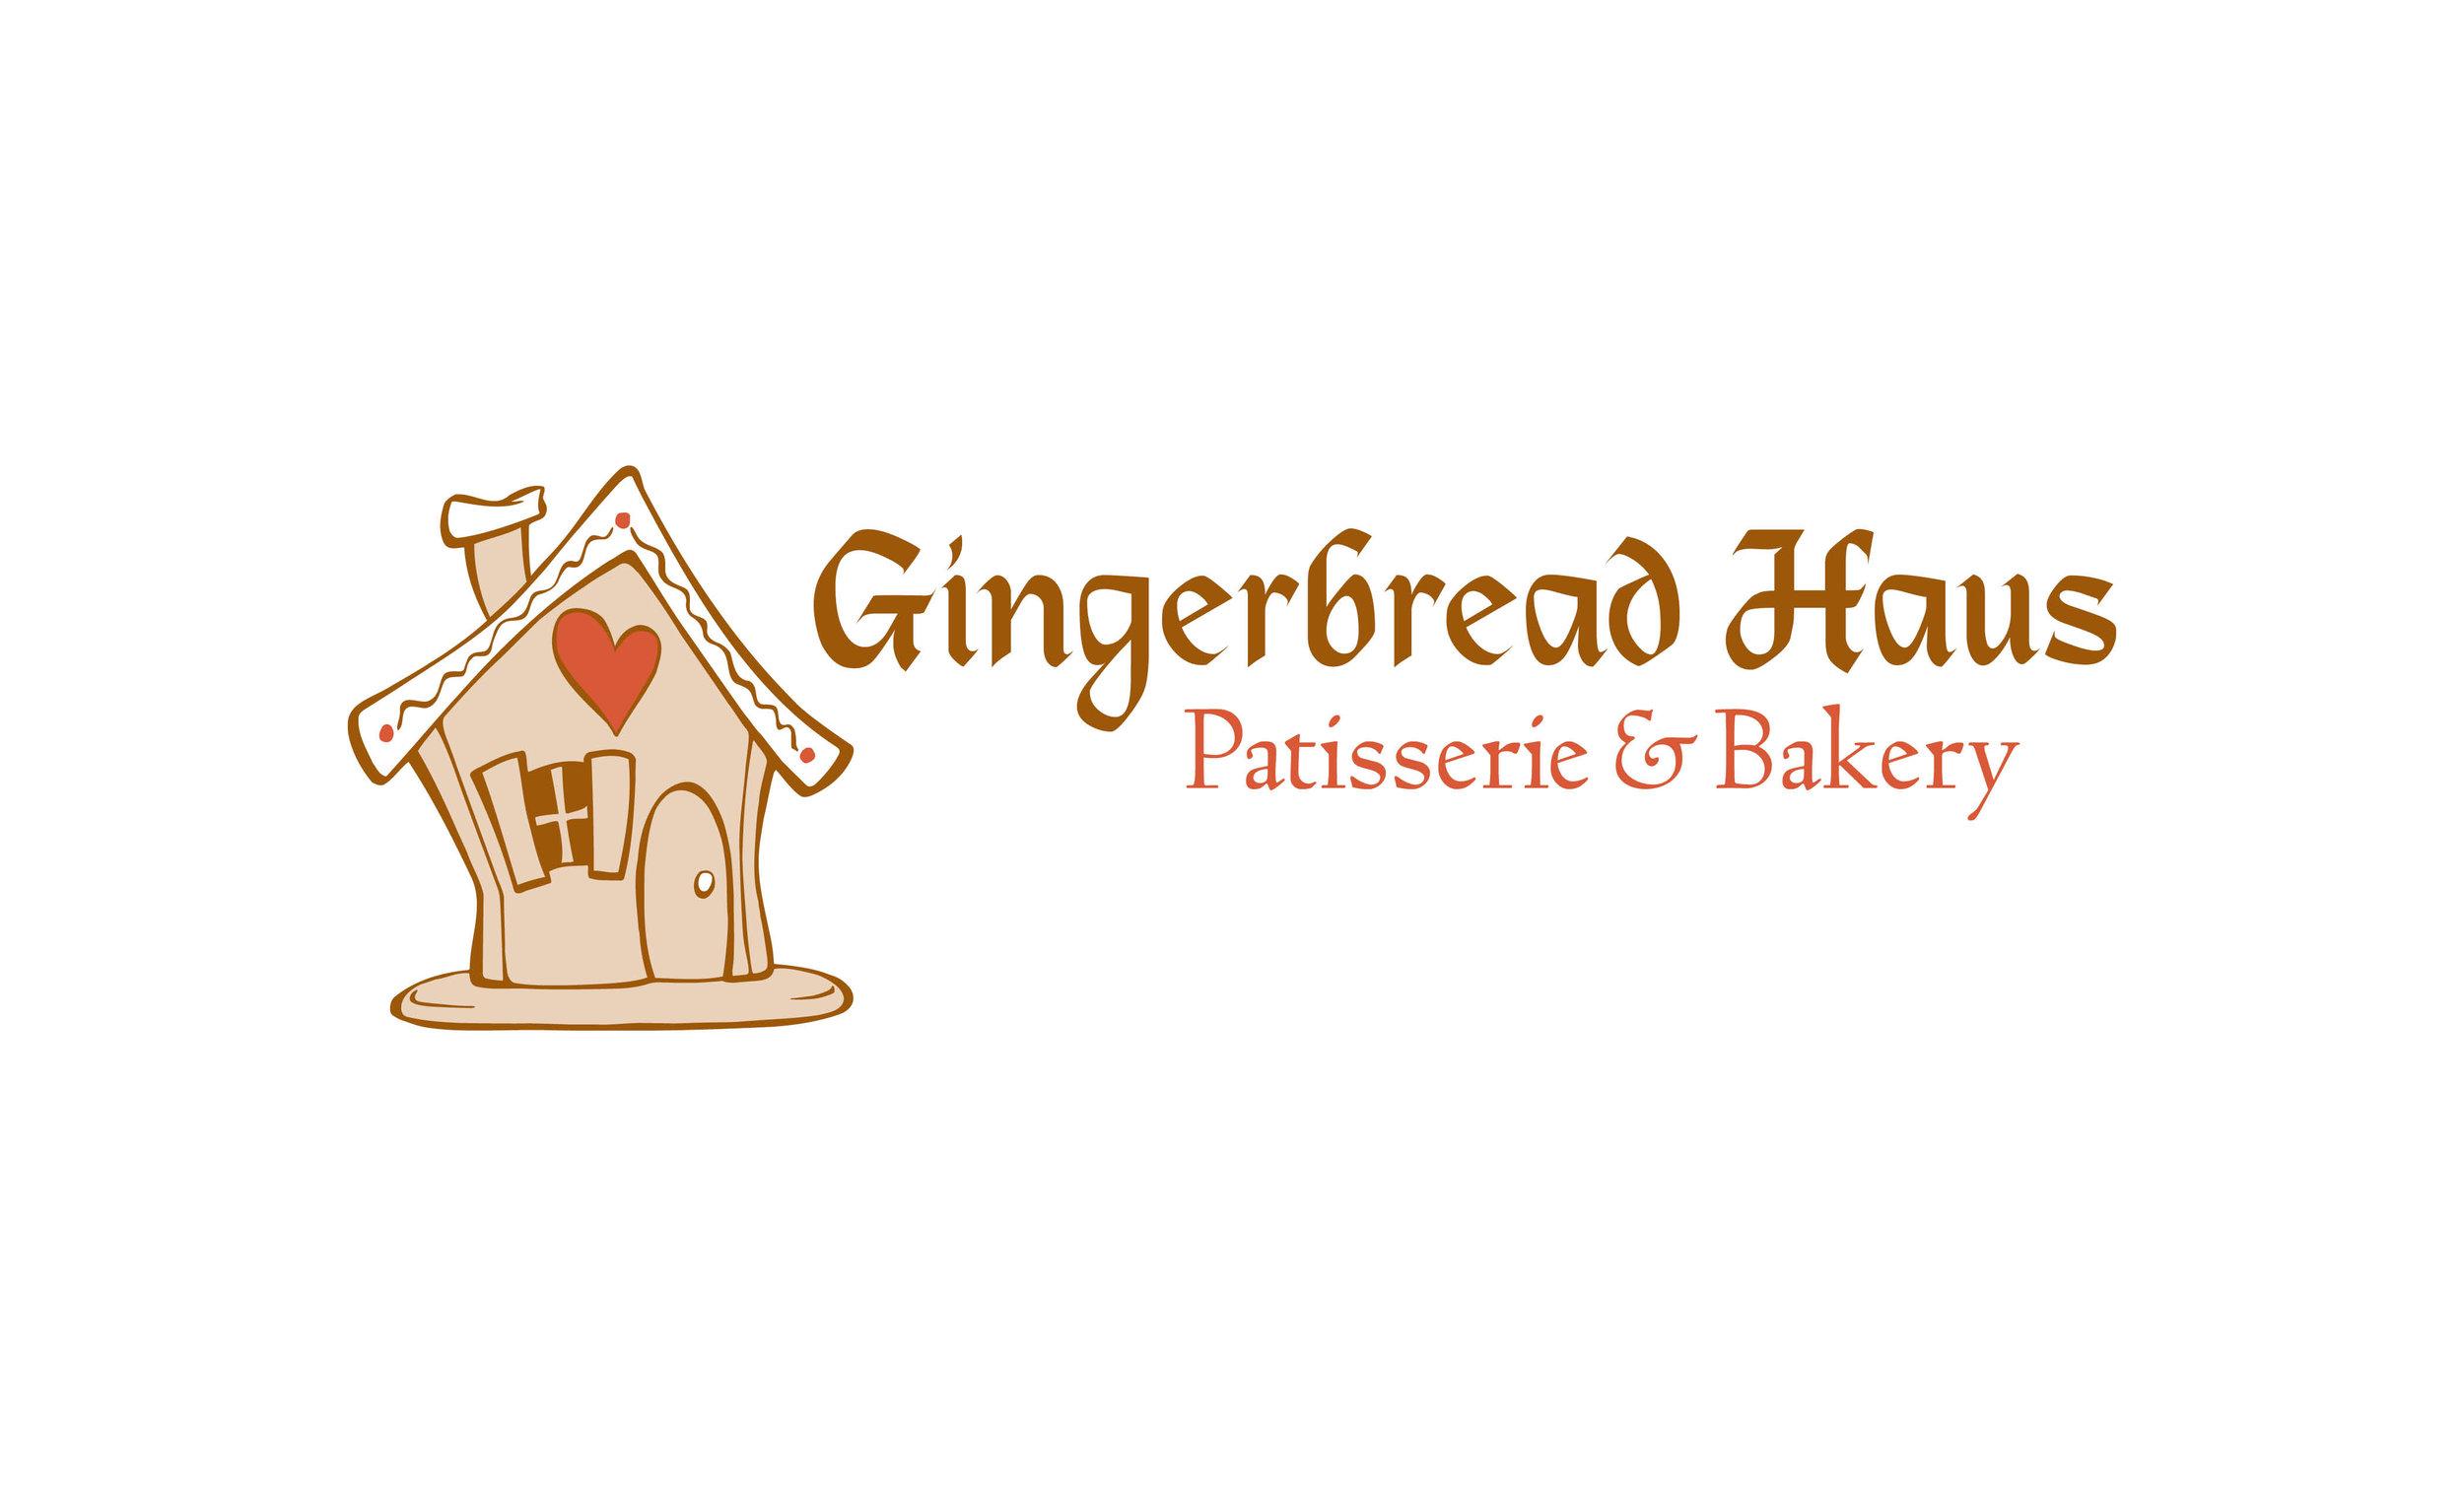 VI_Gingerbread_Haus.jpg